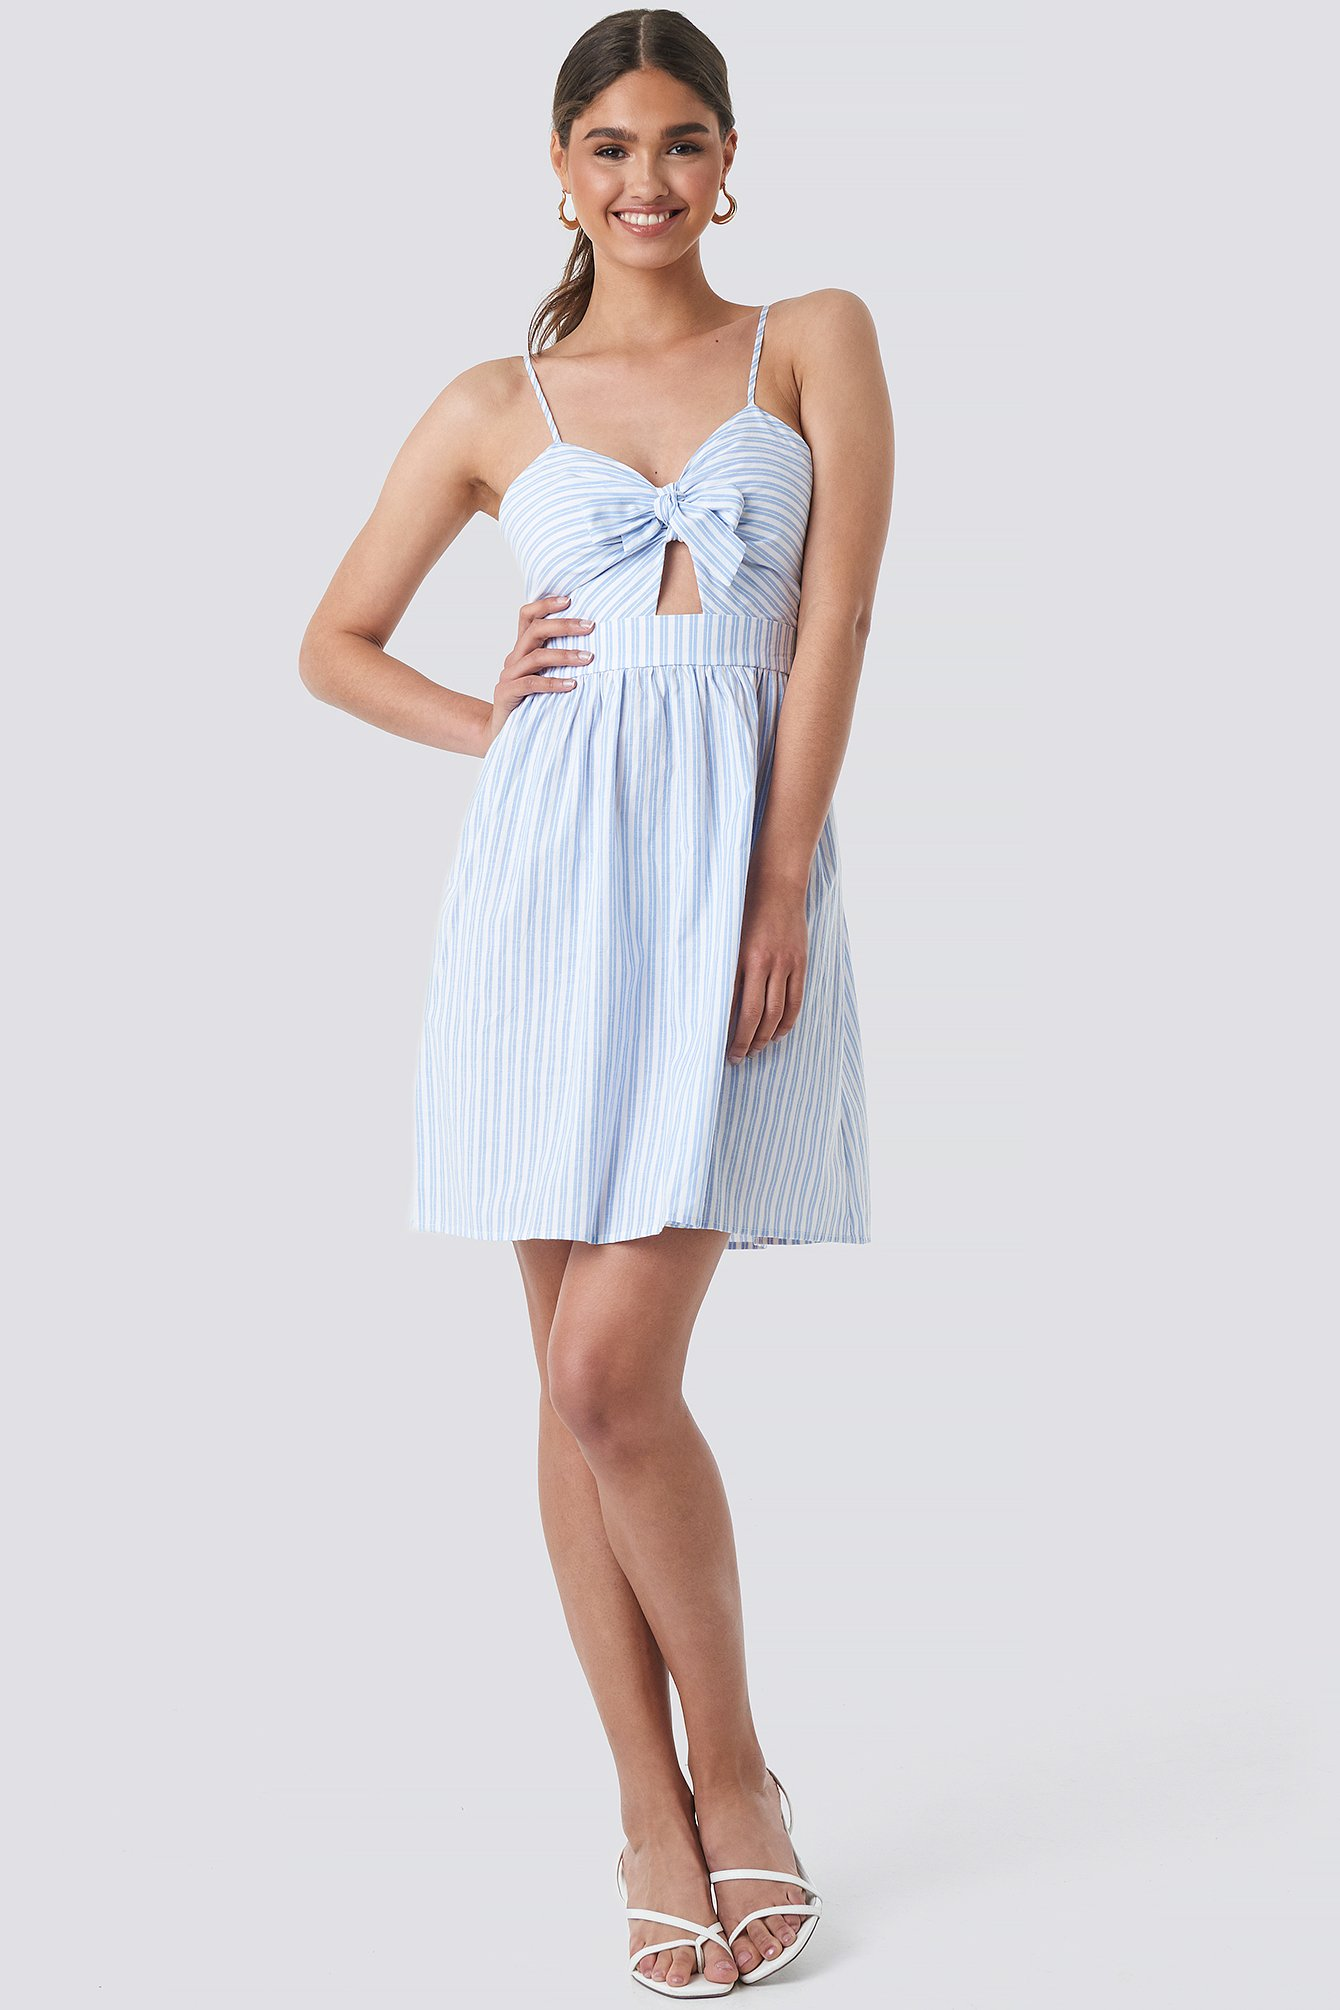 na-kd boho -  Knot Front Cut Out Dress - Blue,Multicolor